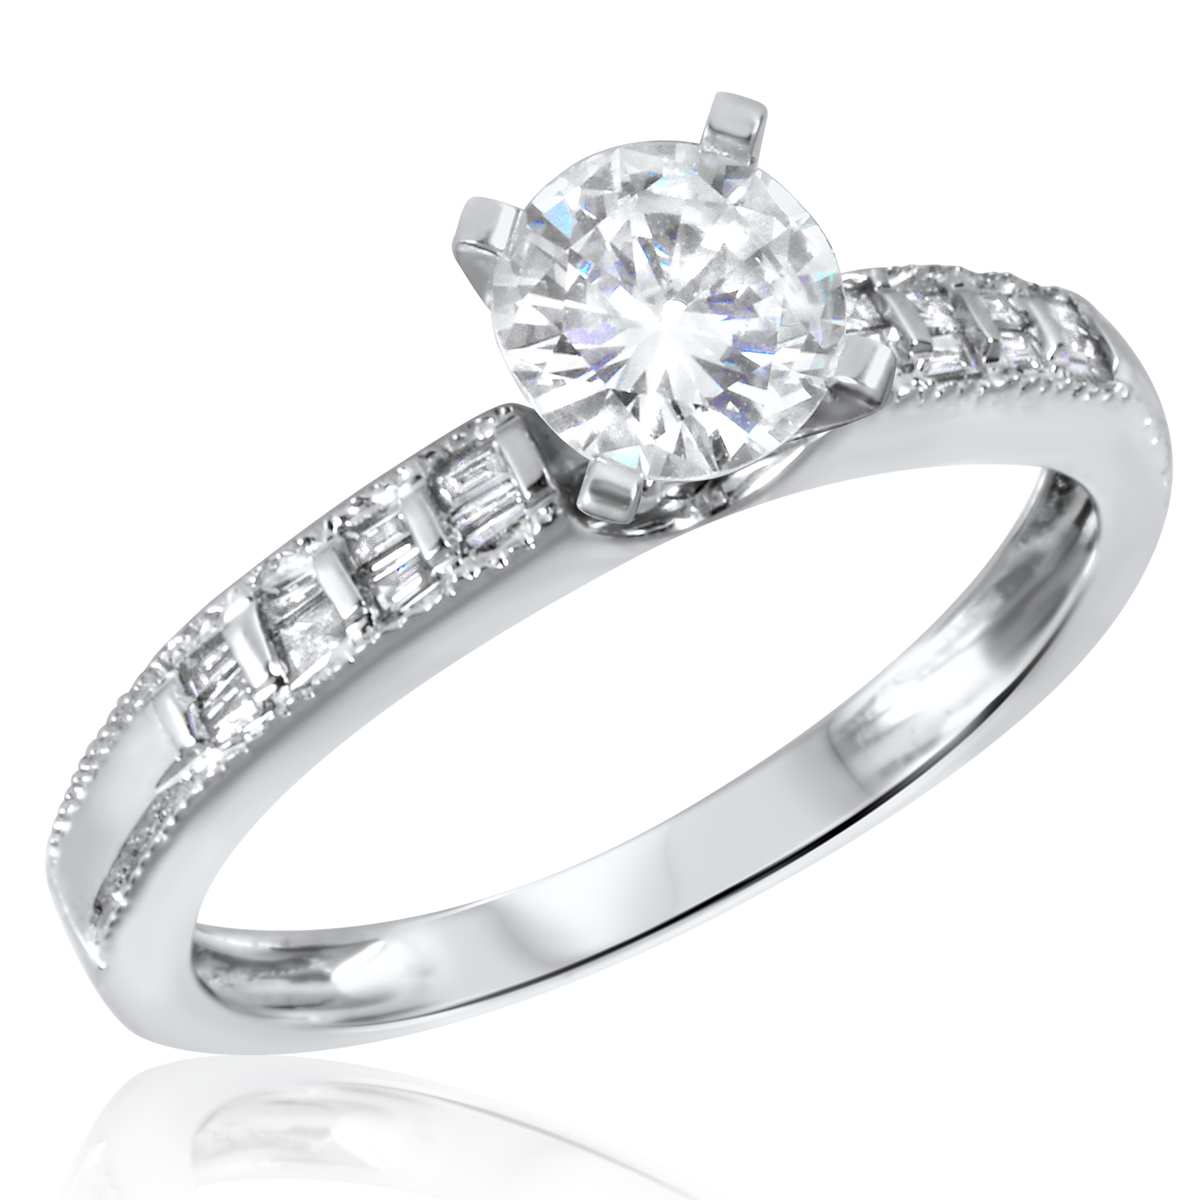 7/8 CT. T.W. Diamond Ladies Engagement Ring 10K White Gold- Size 8